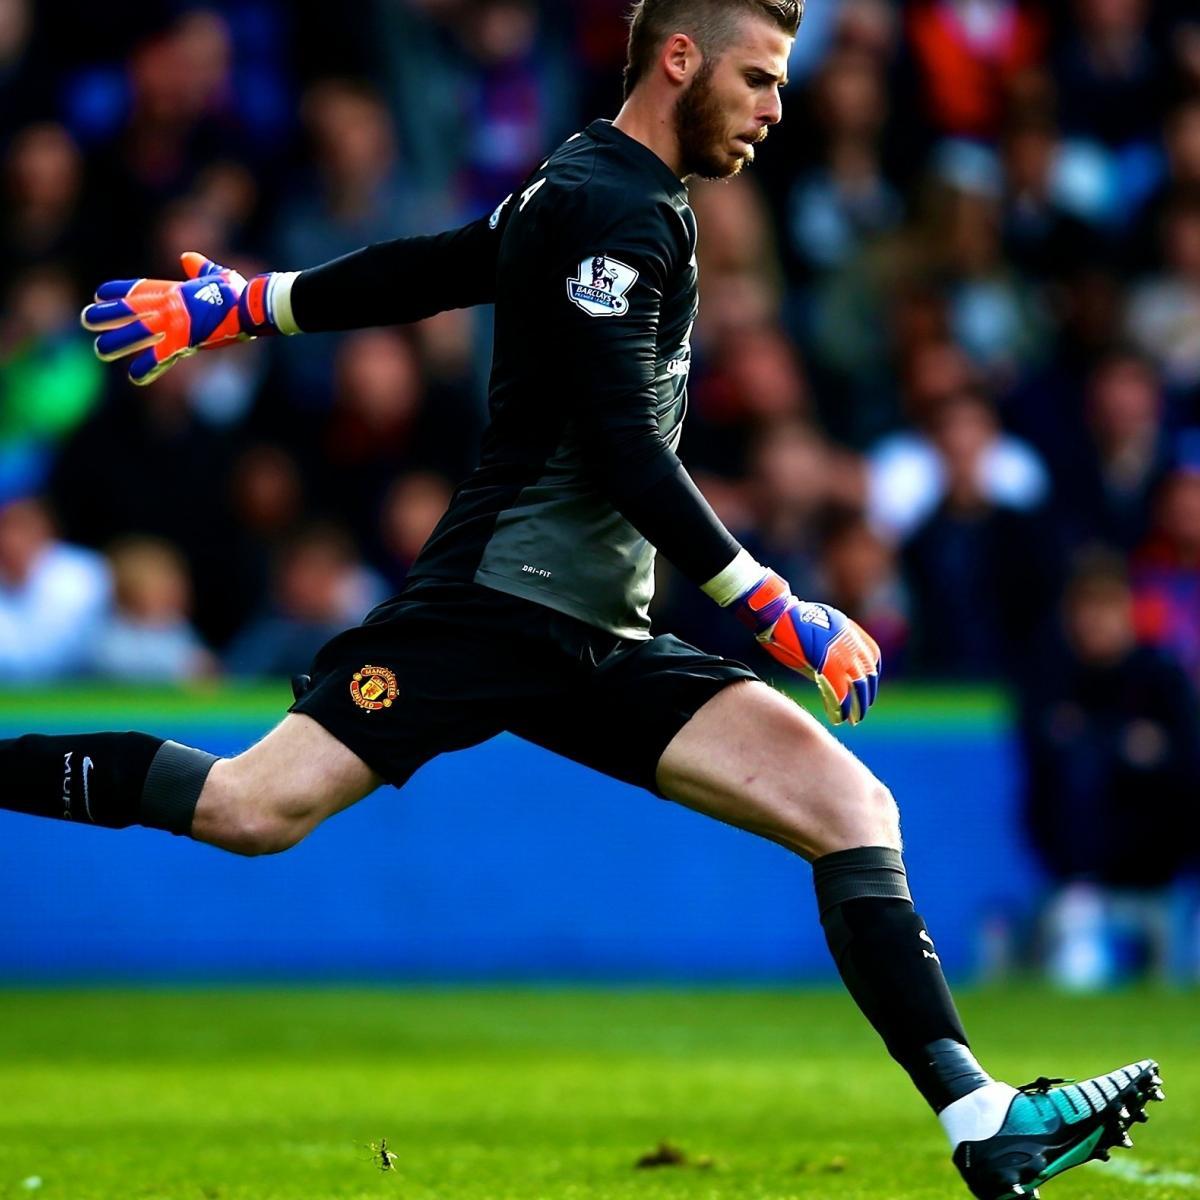 Psg Vs Manchester City Live Score Highlights From: Manchester United Vs. Barcelona: Live Score, Highlights